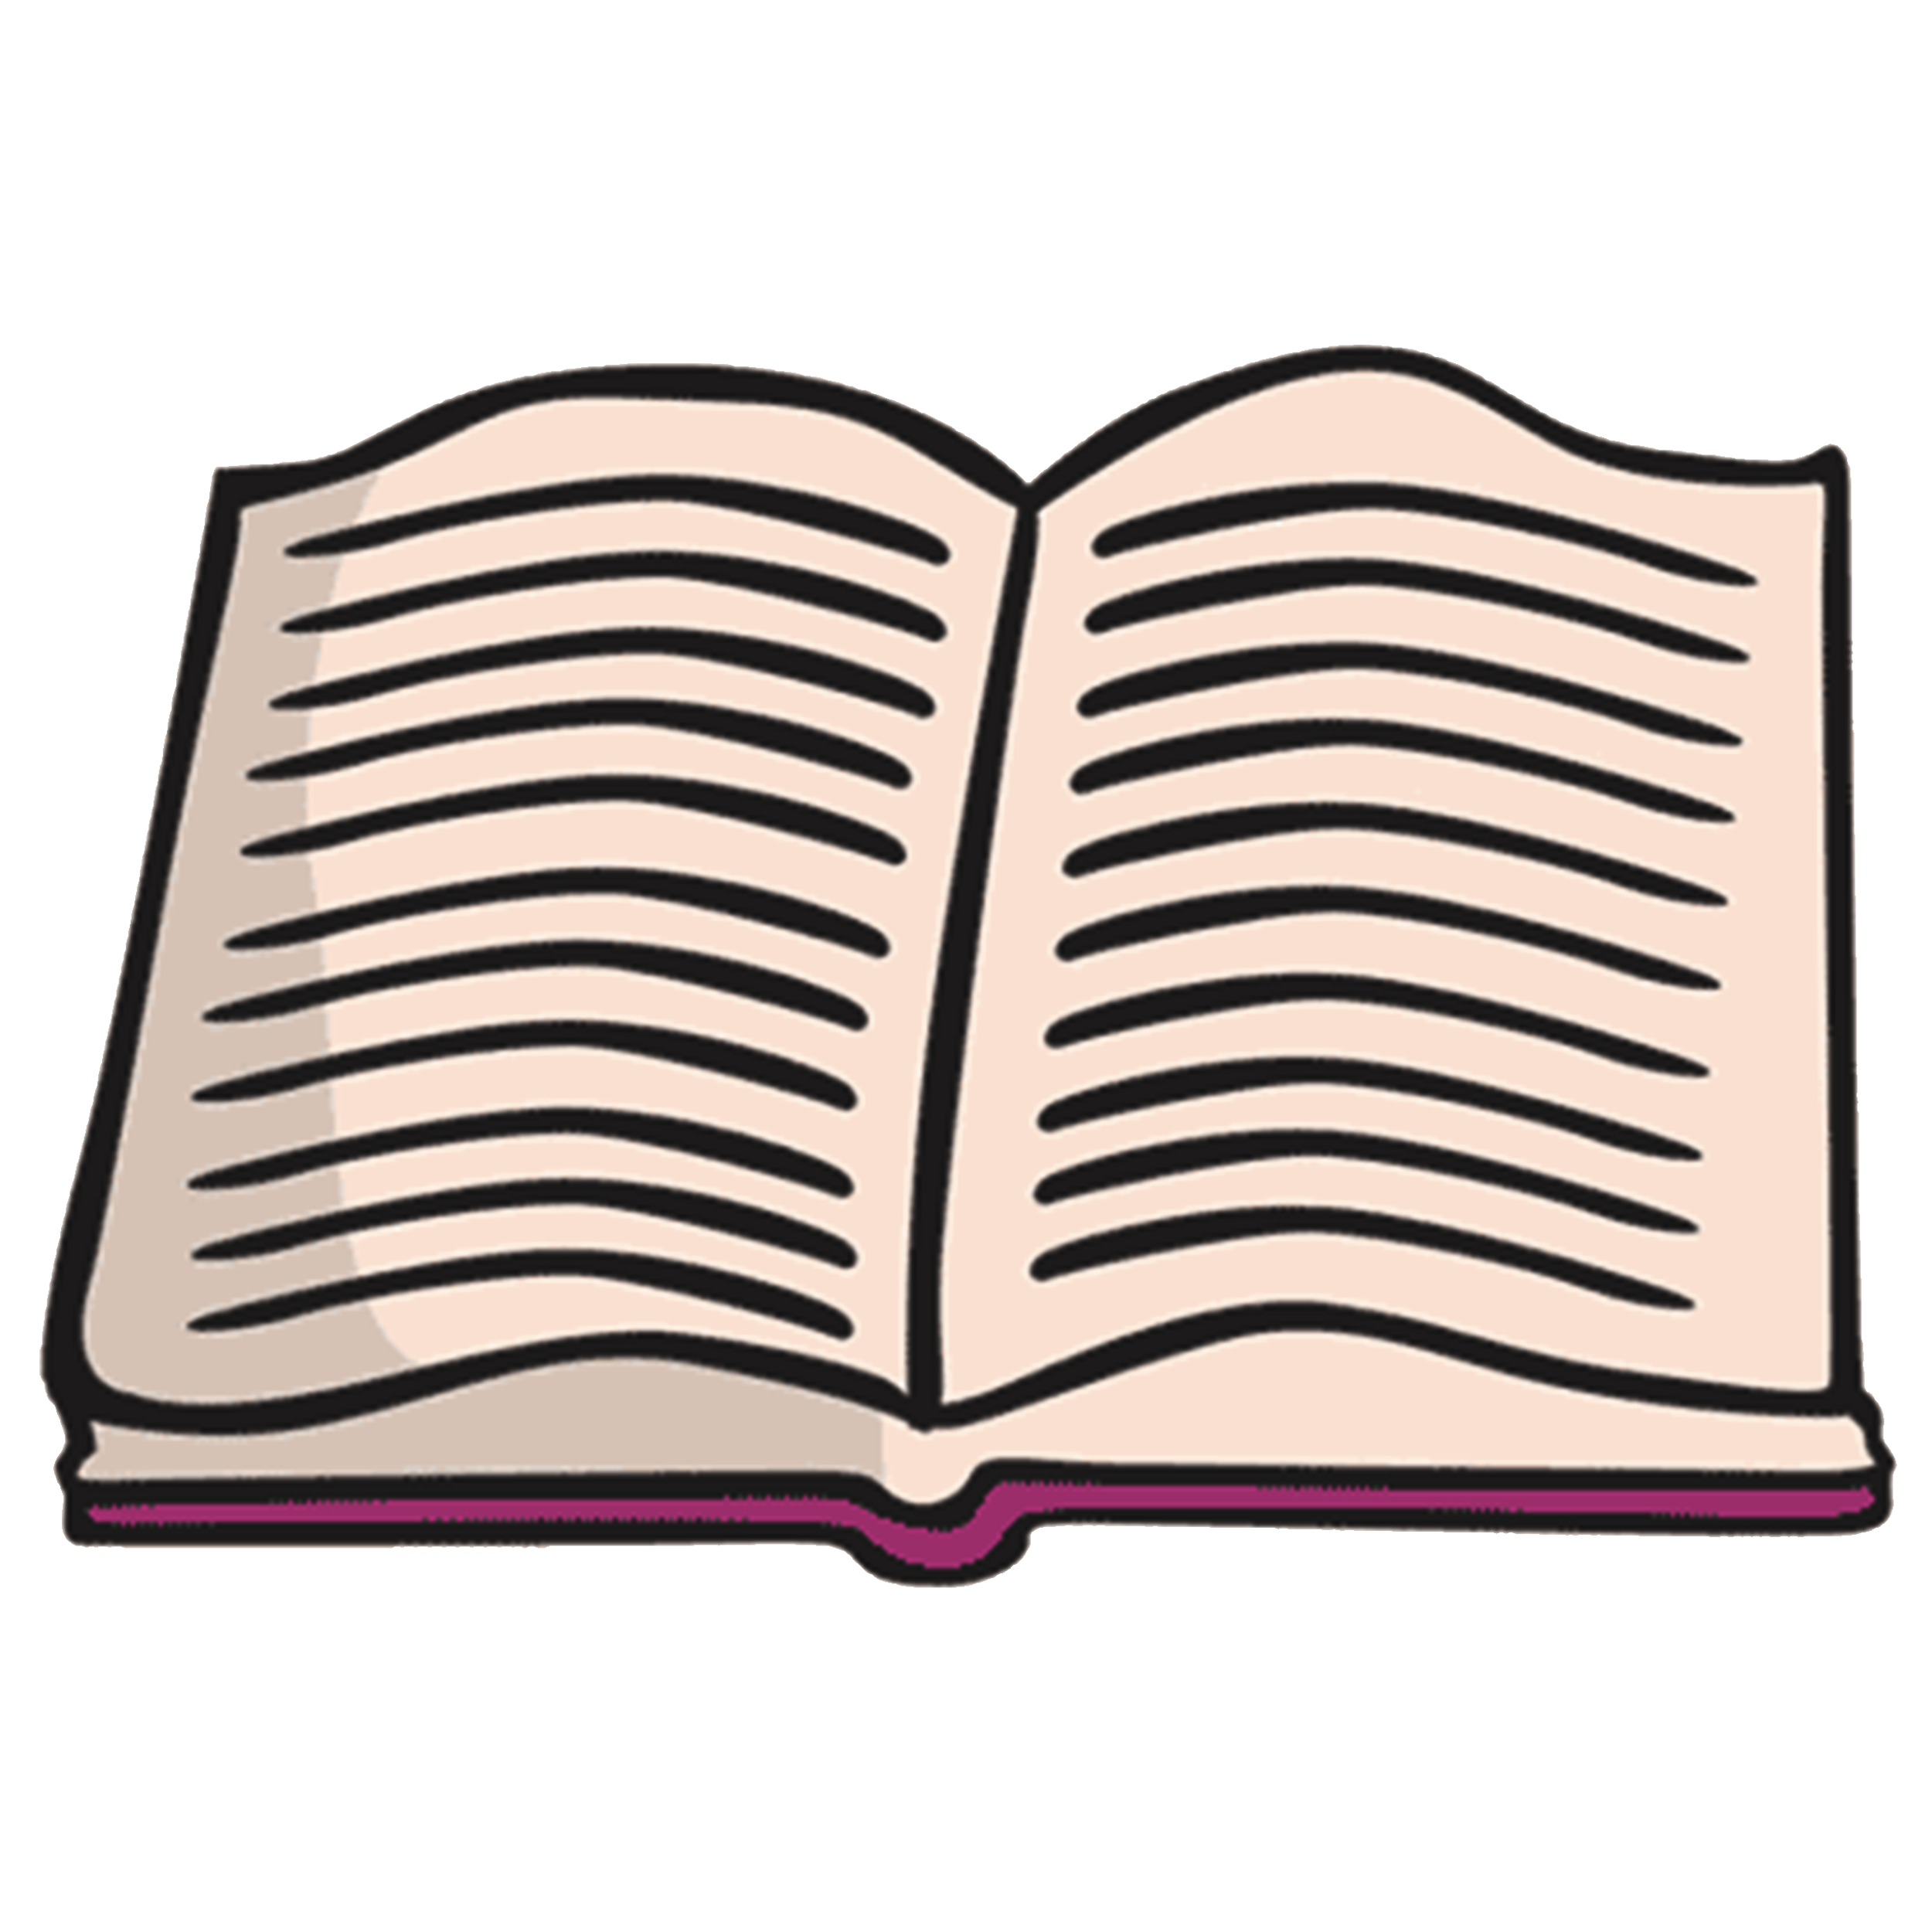 Down Syndrom - das Buch